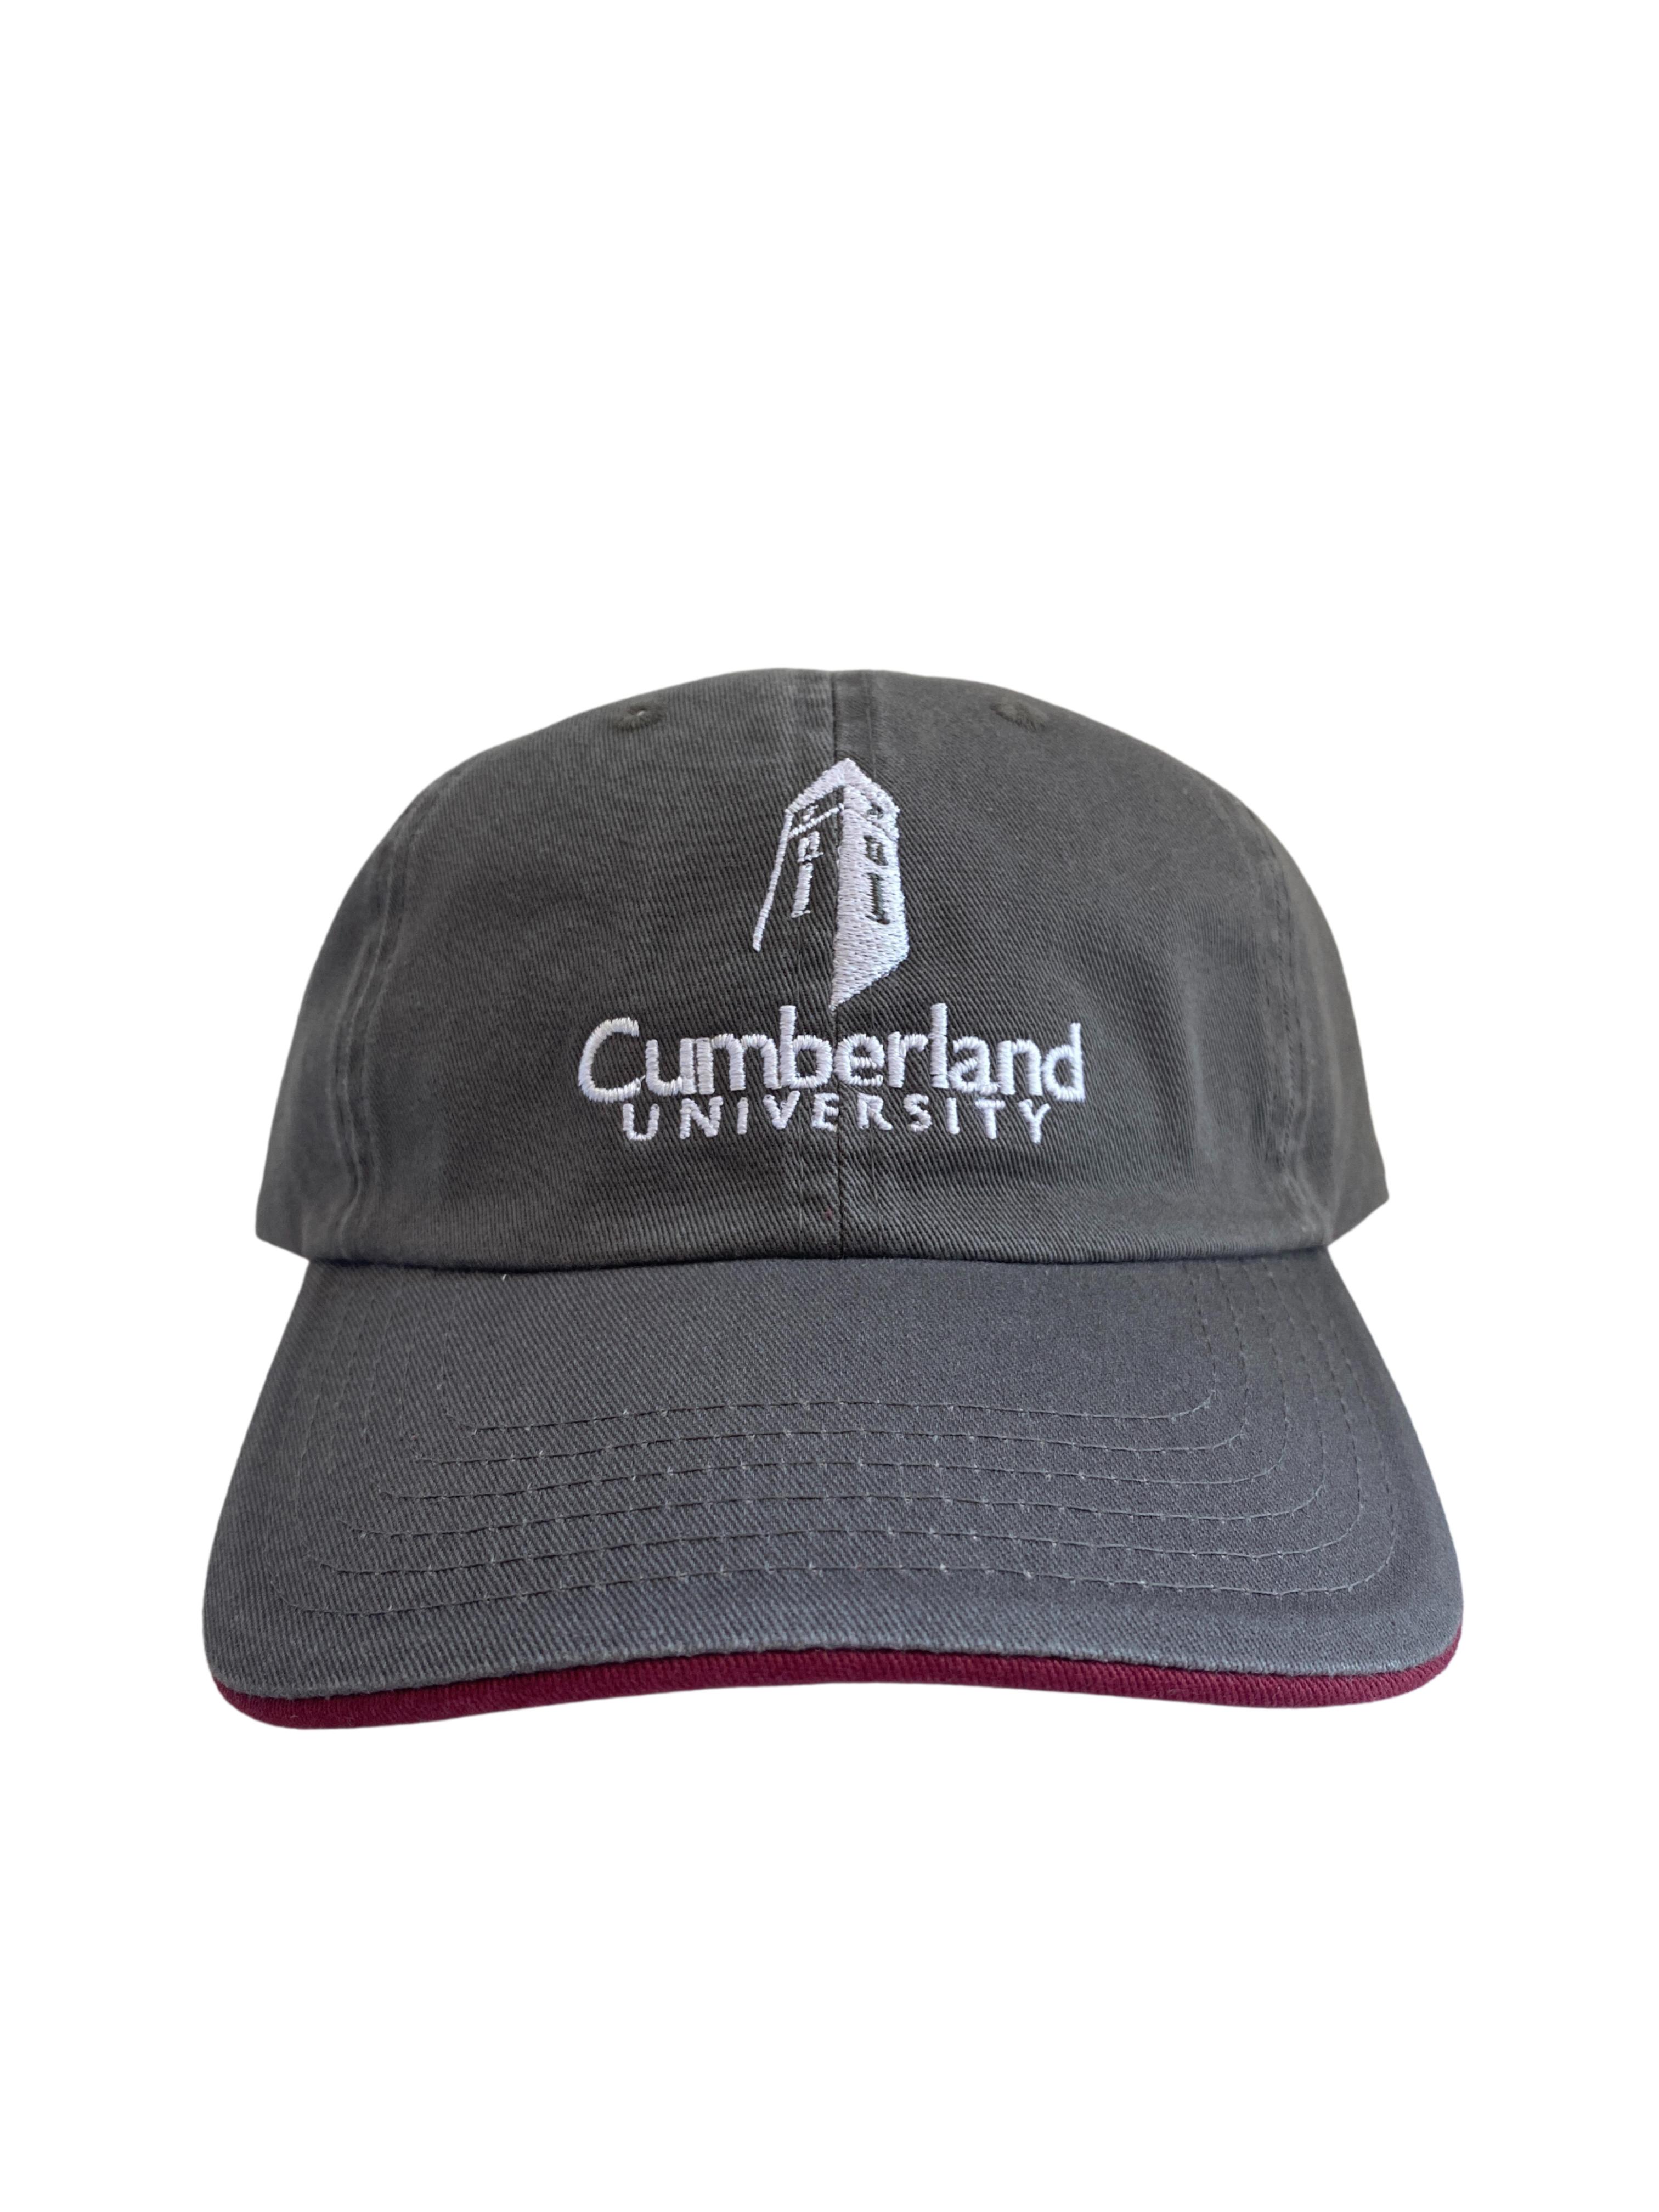 Cumberland University Hat